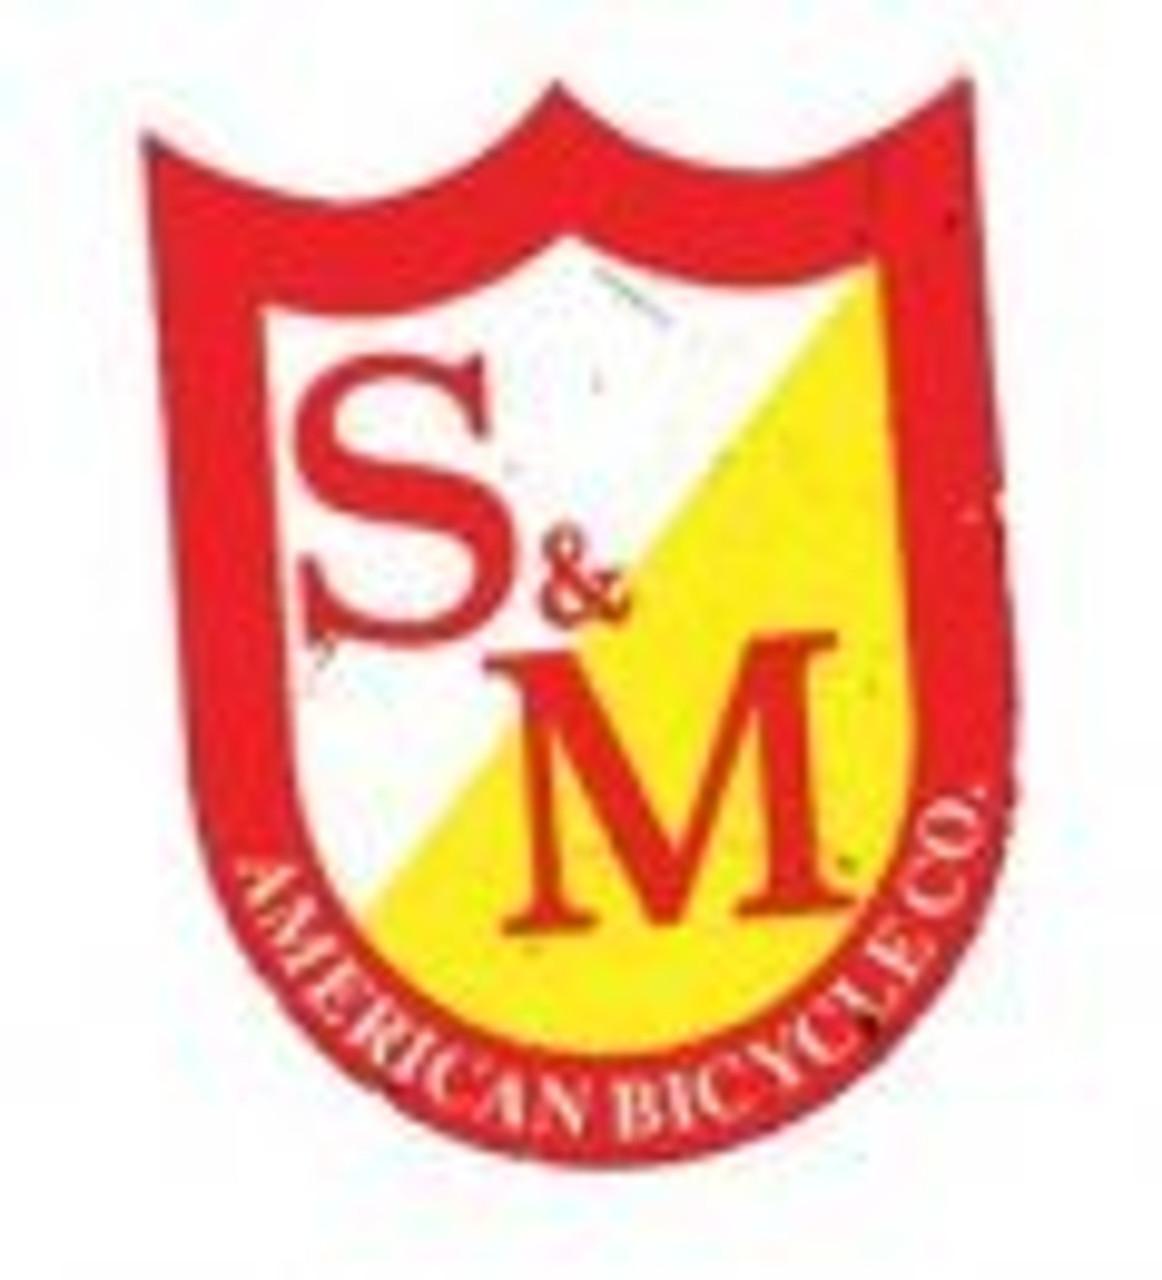 S&M BMX